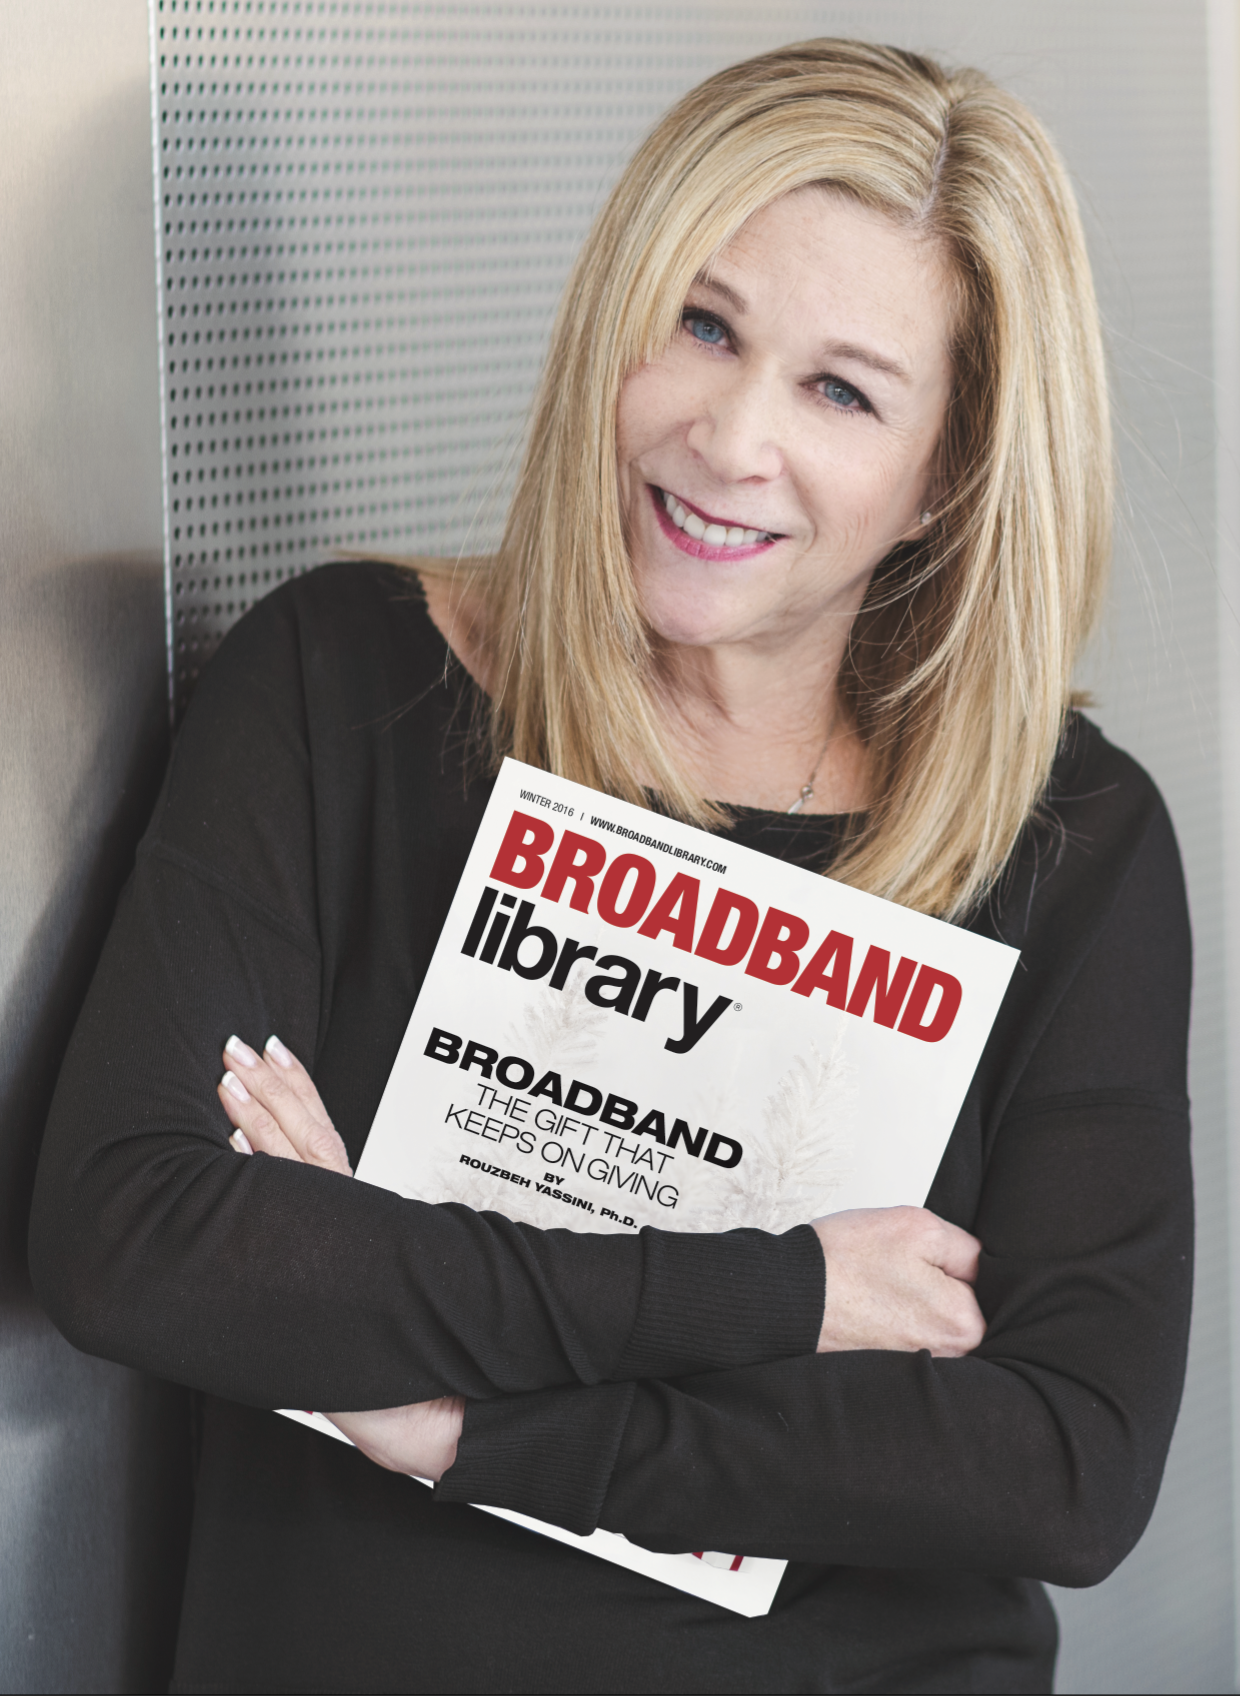 Cathy Wilson founder Broadband Library